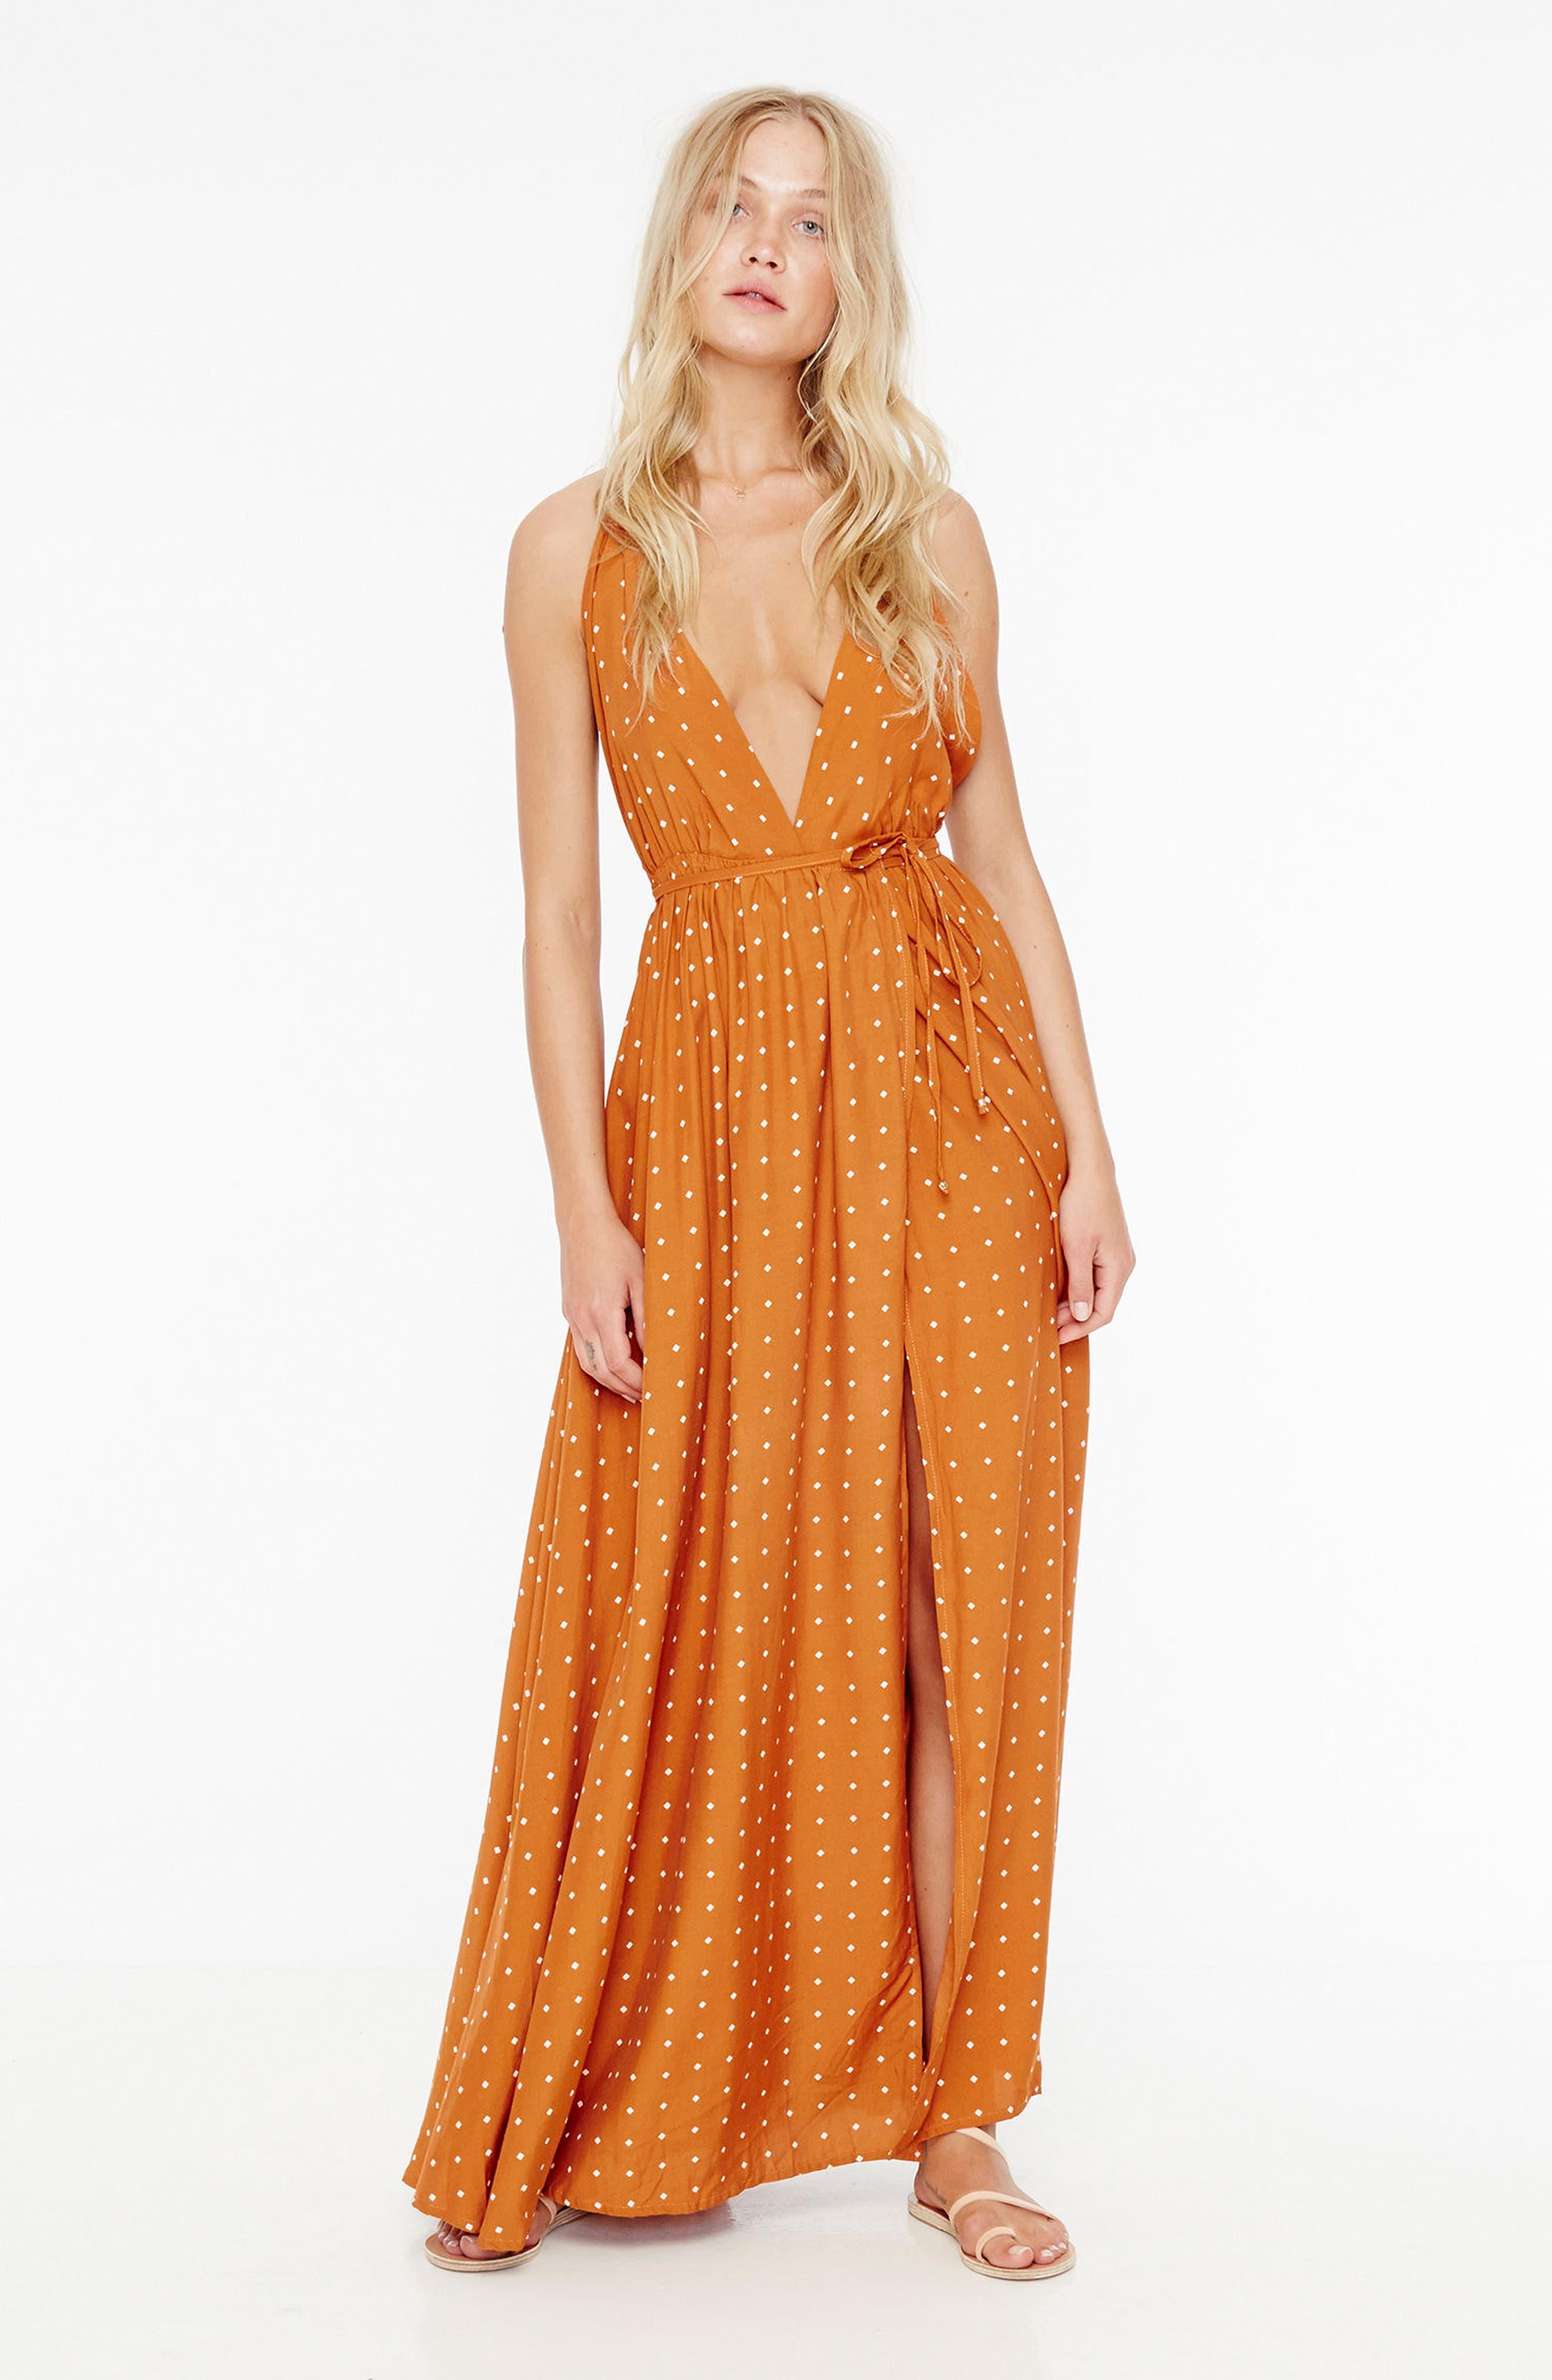 Santa Rosa Maxi Dress,                             Alternate thumbnail 7, color,                             Stefano Print - Ginger